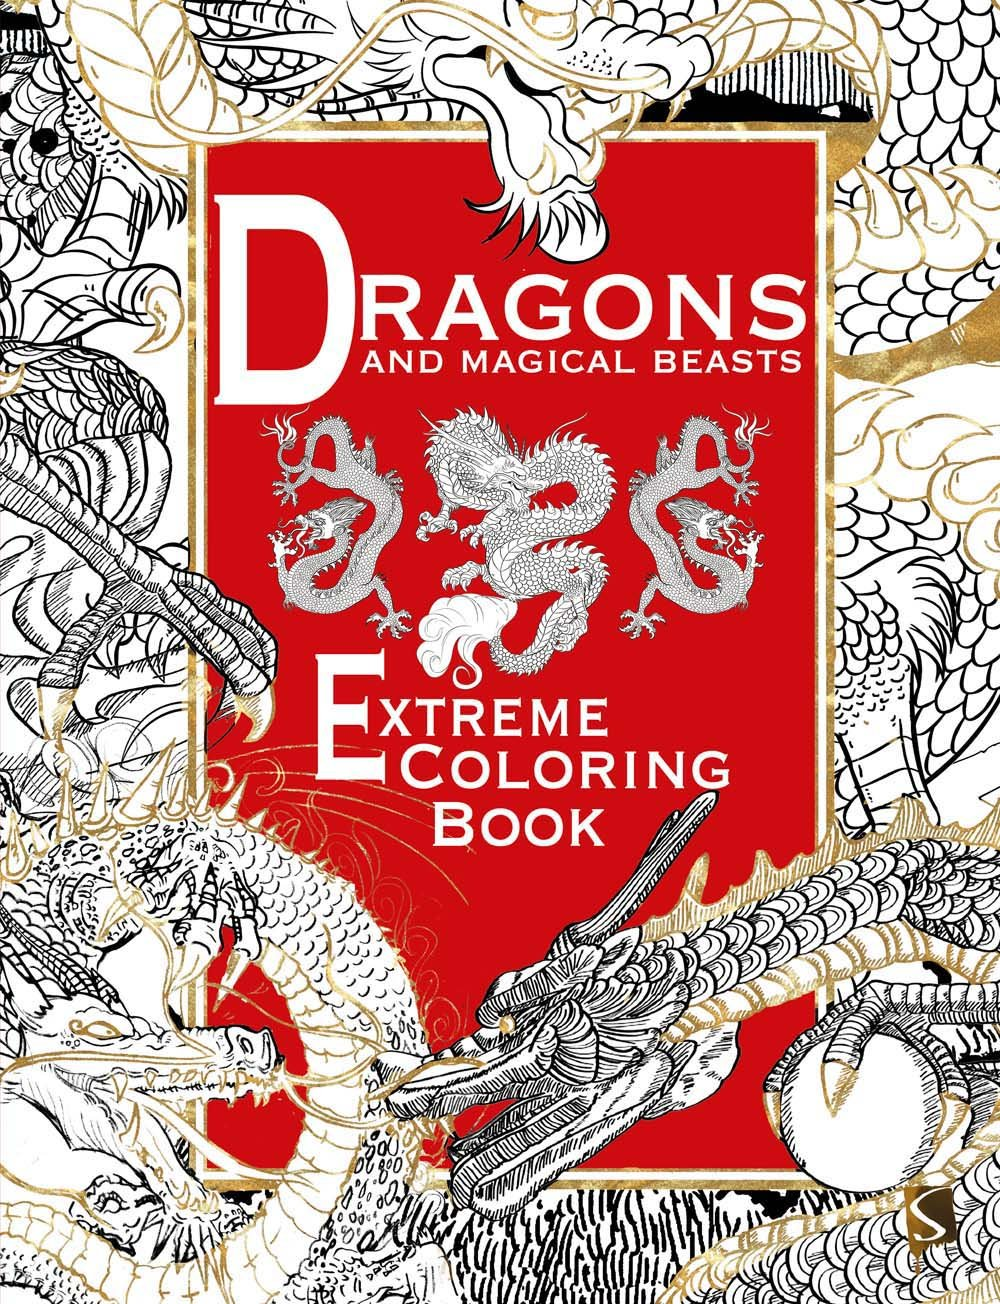 Japanese Dragon Sketch Tee Men/'s Image by Shutterstock